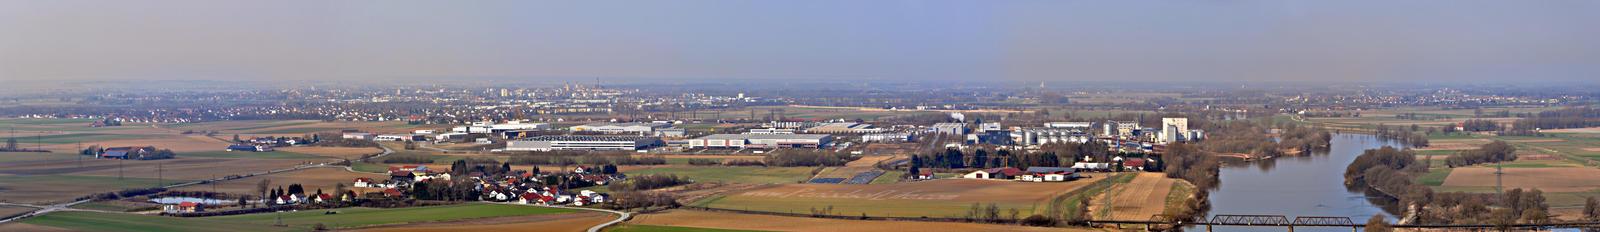 Straubing Panorama by PeriodsofLife